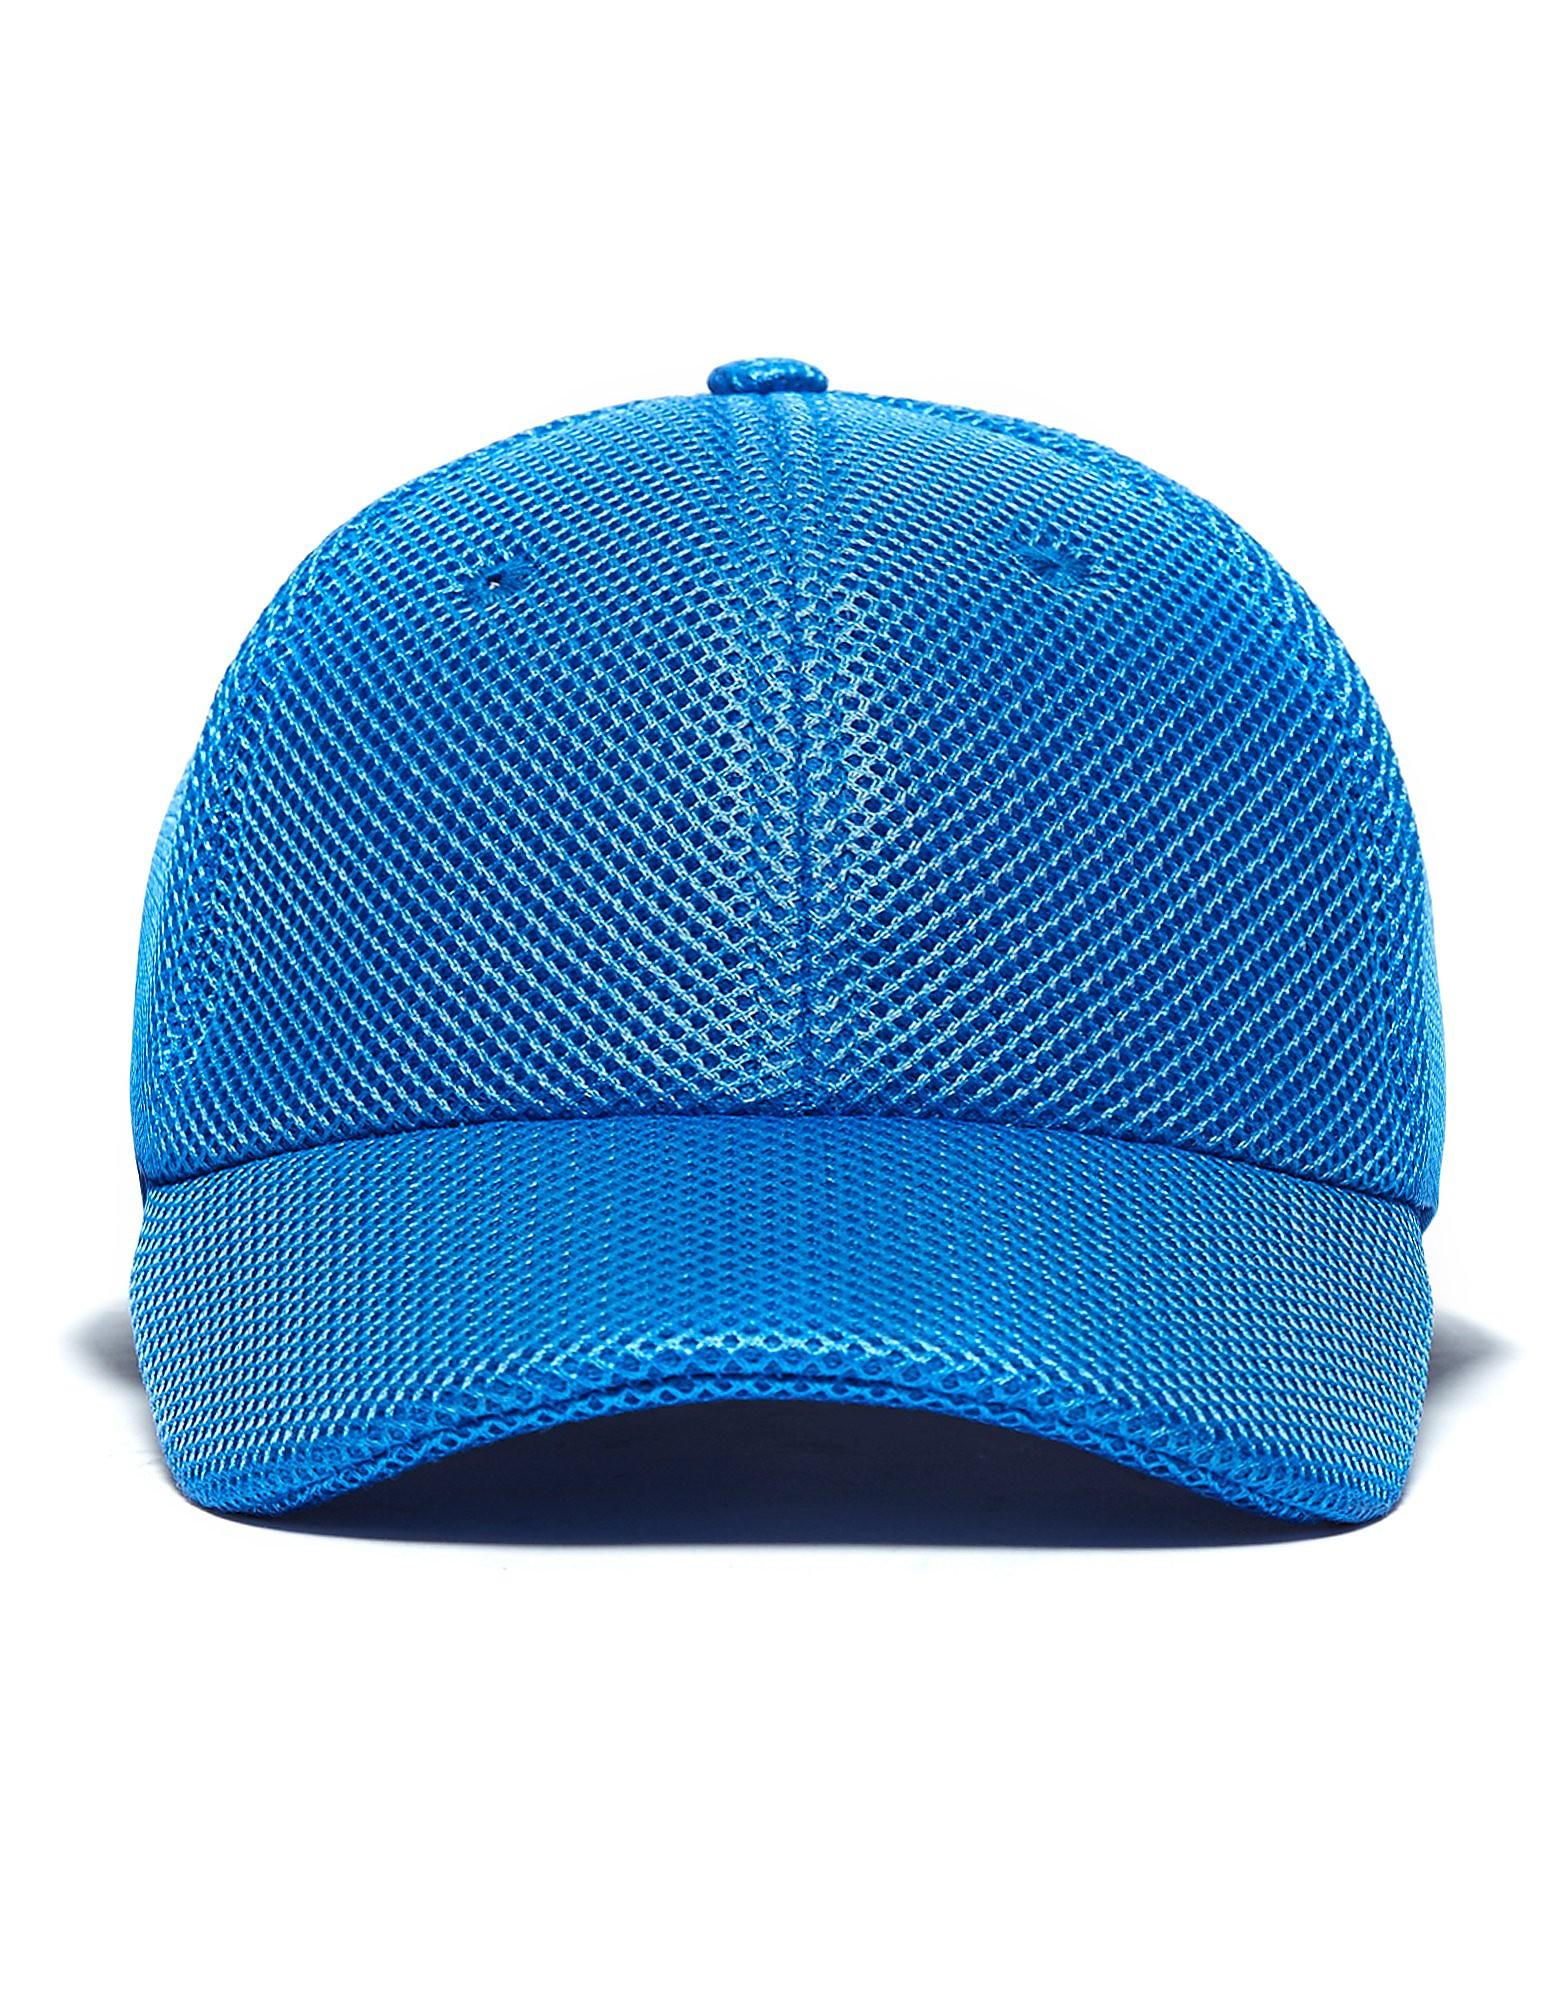 IVY PARK Mesh Baseball Cap